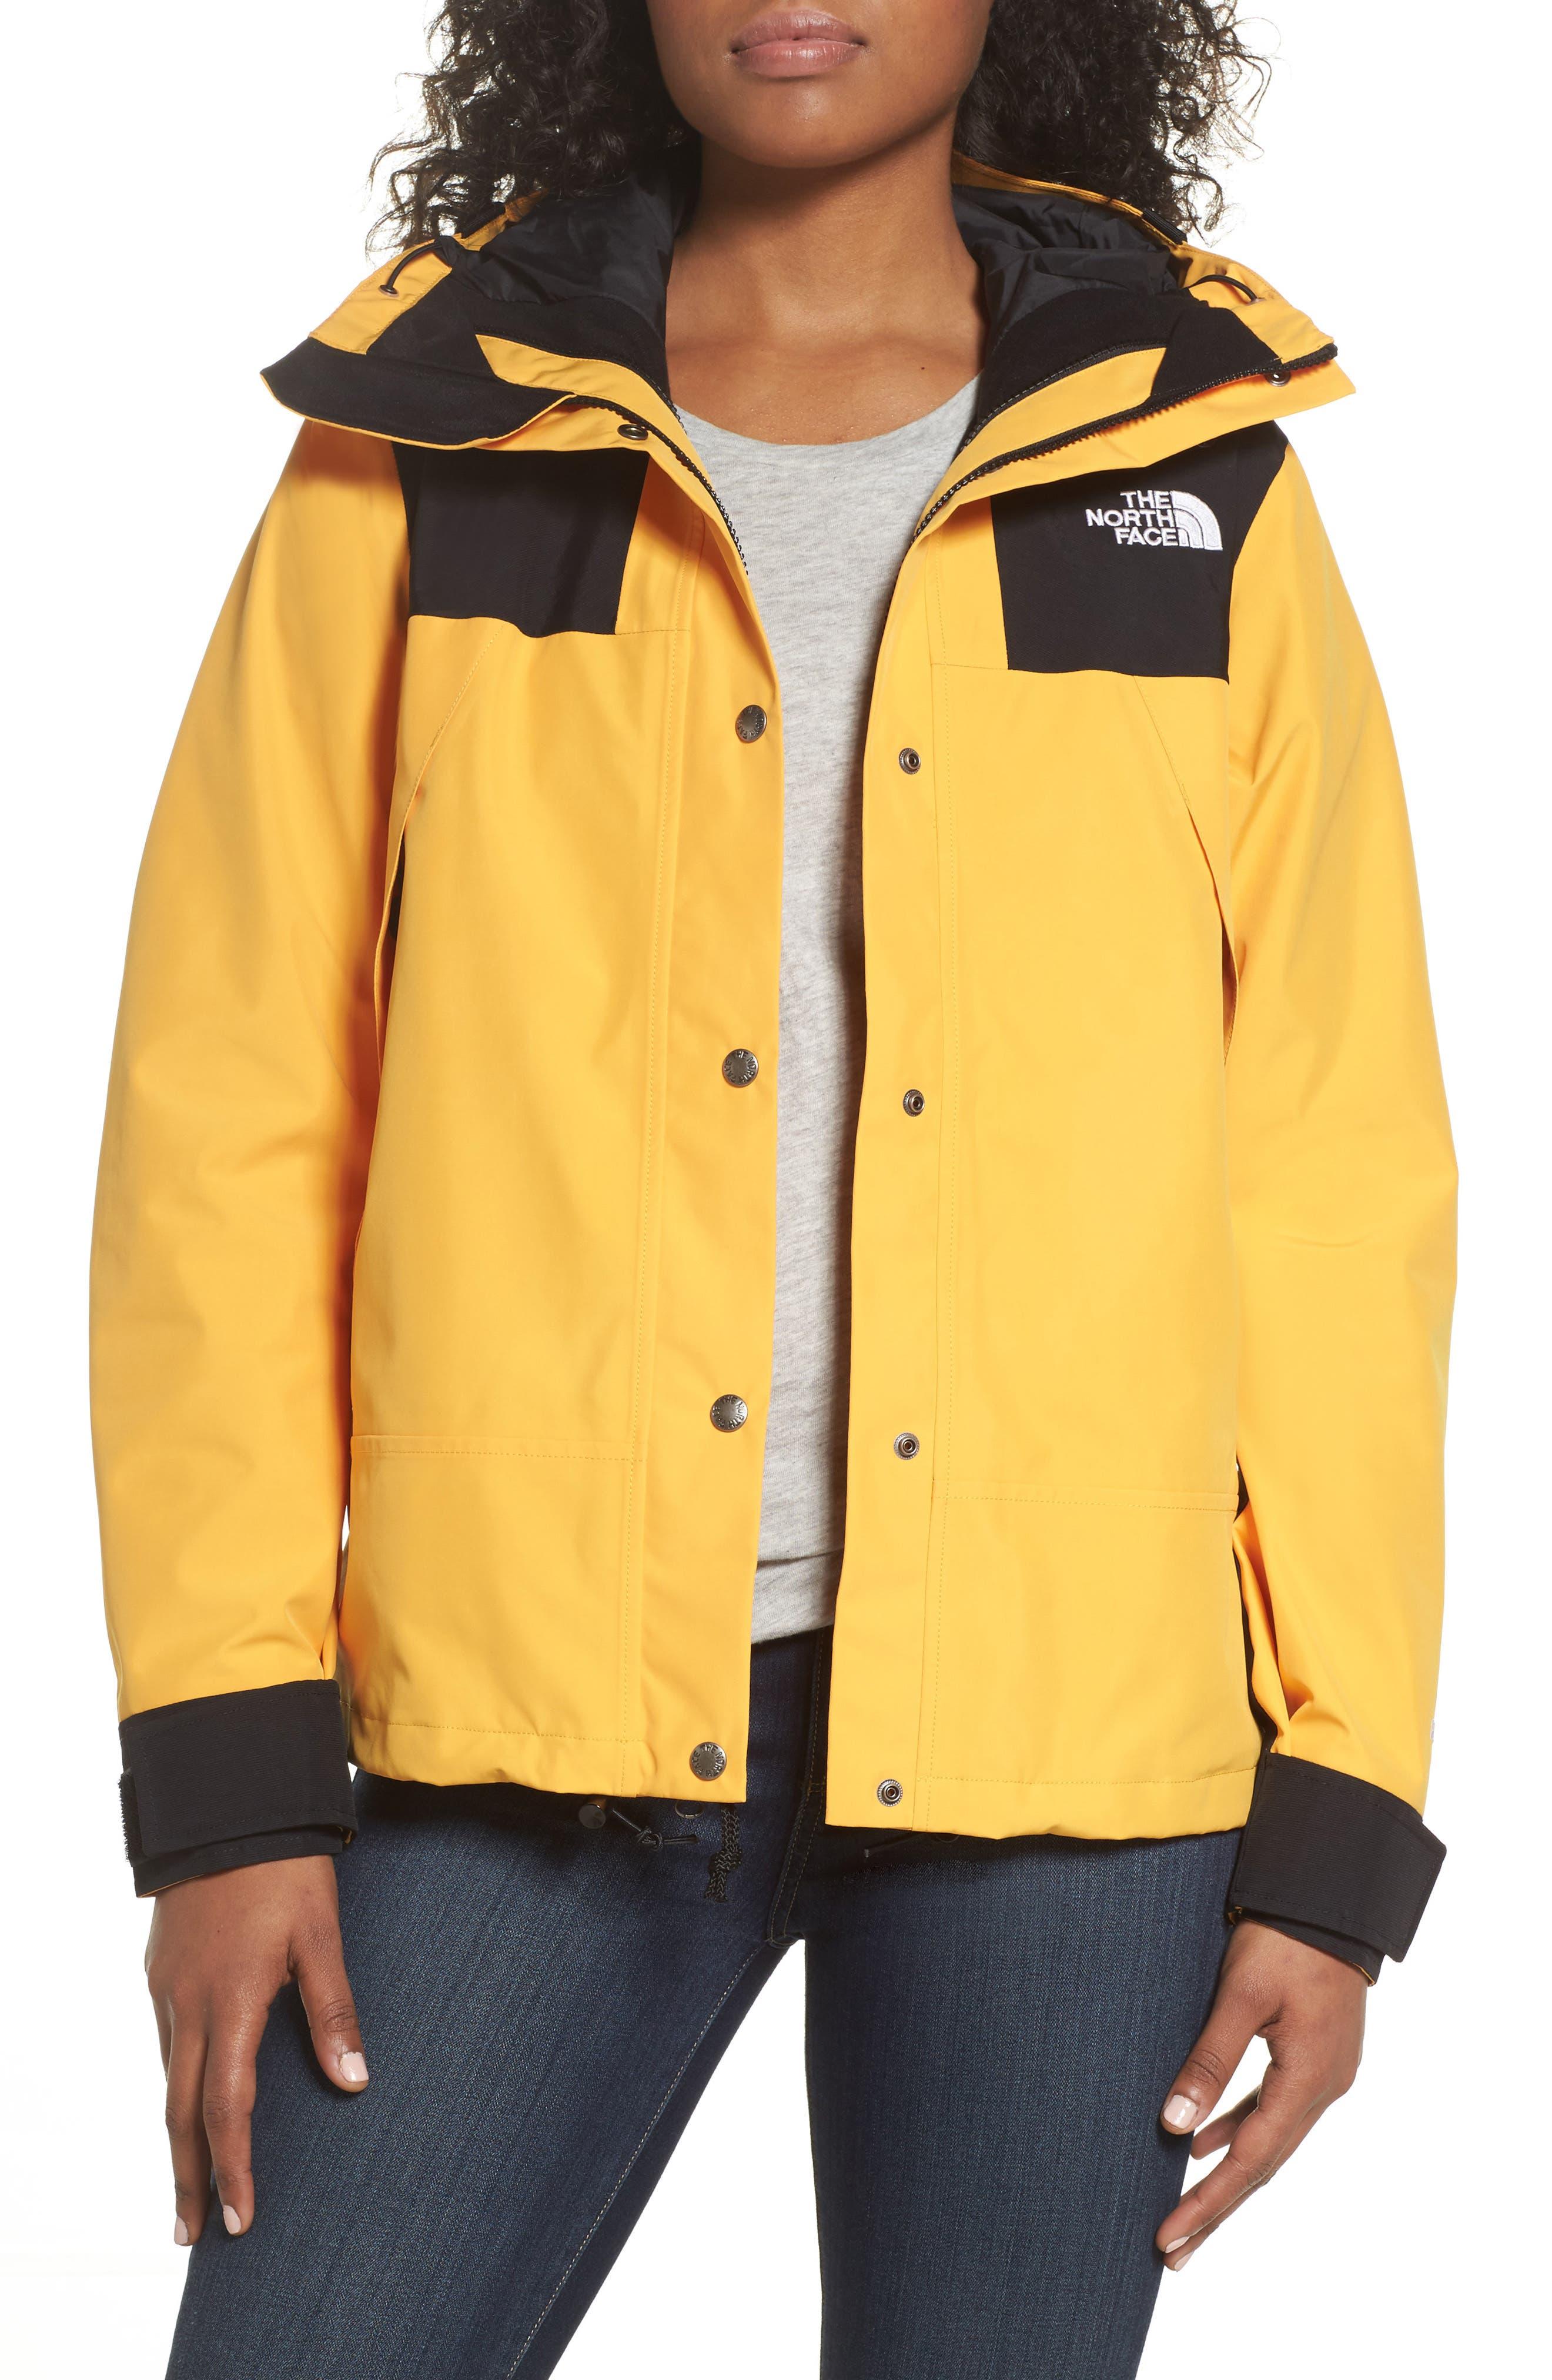 1990 Mountain Jacket,                         Main,                         color, Tnf Yellow